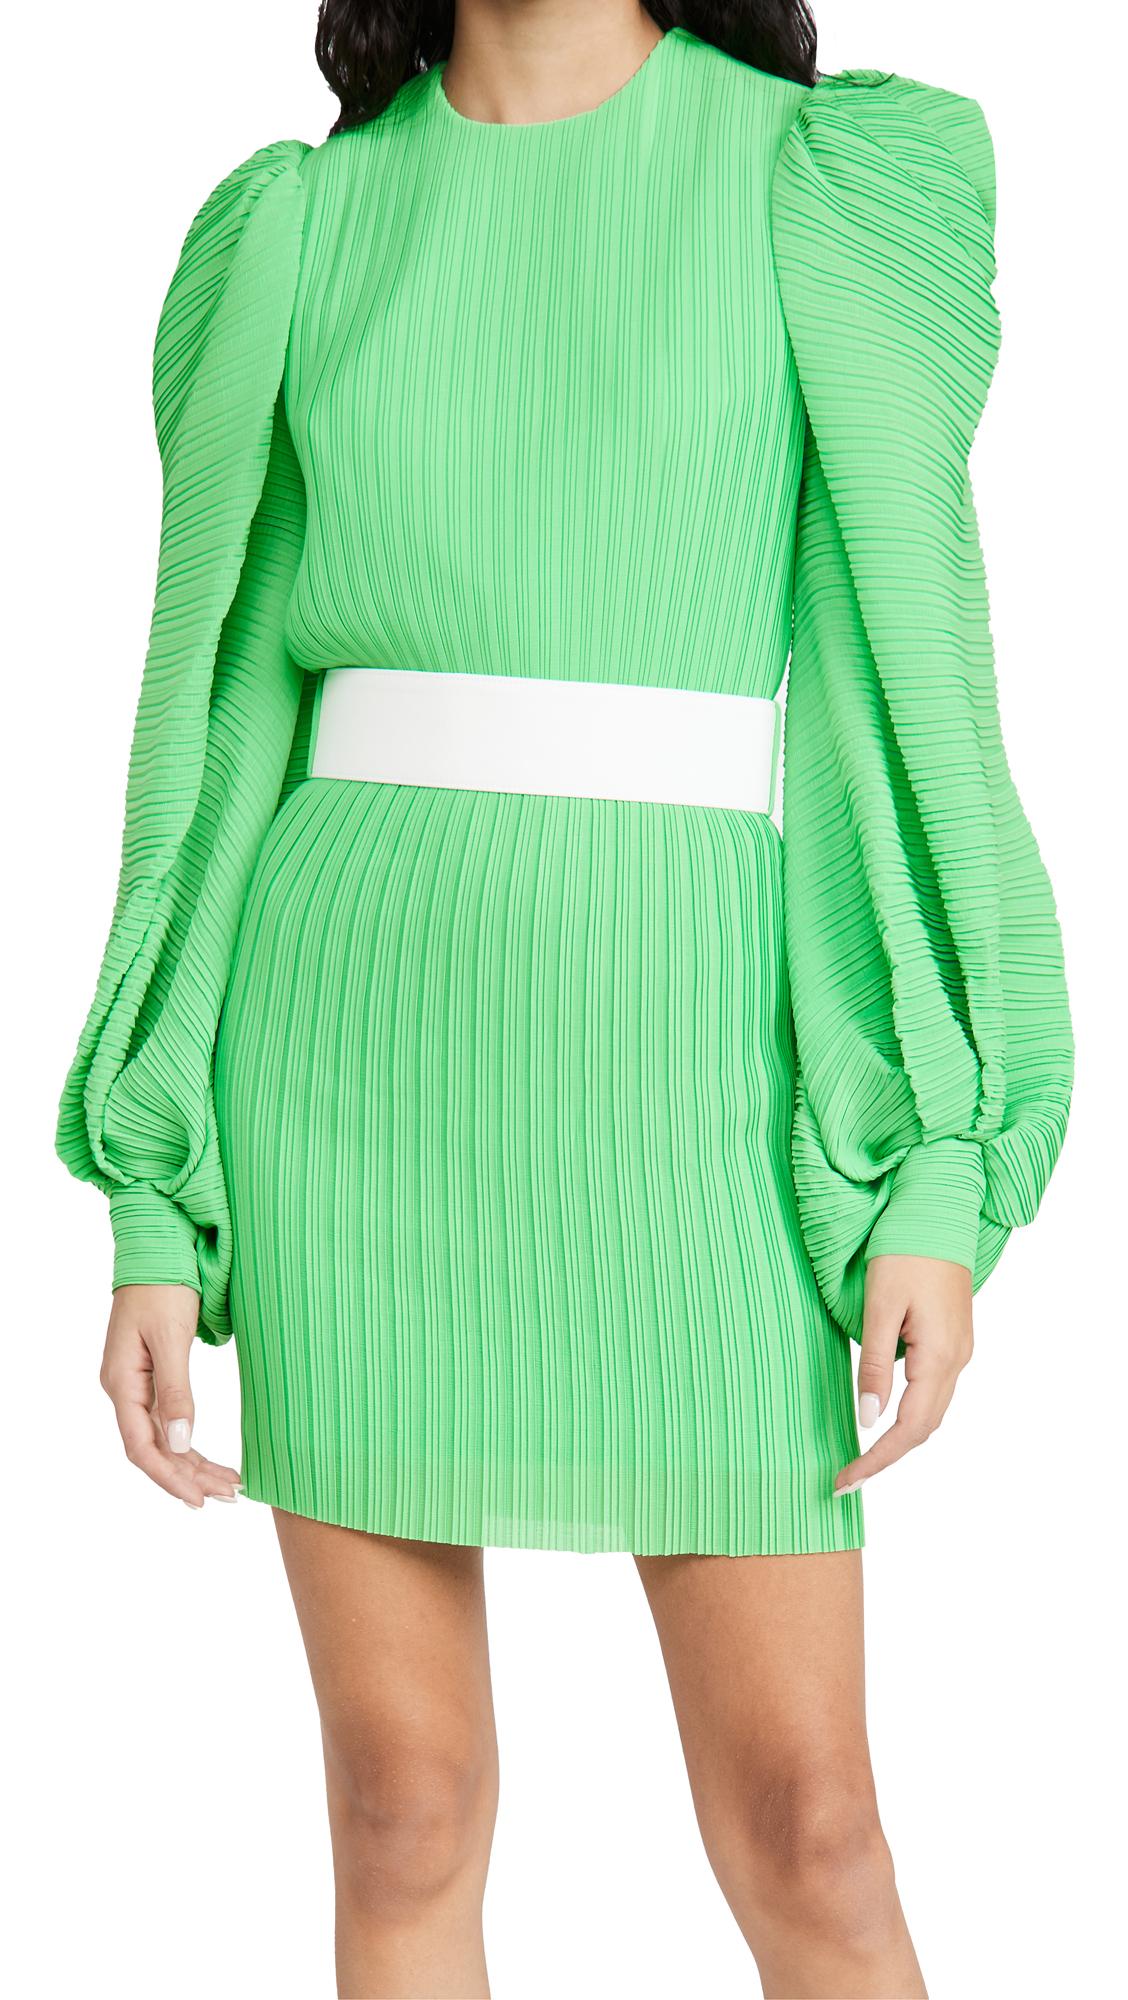 Solace London Marina Mini Dress